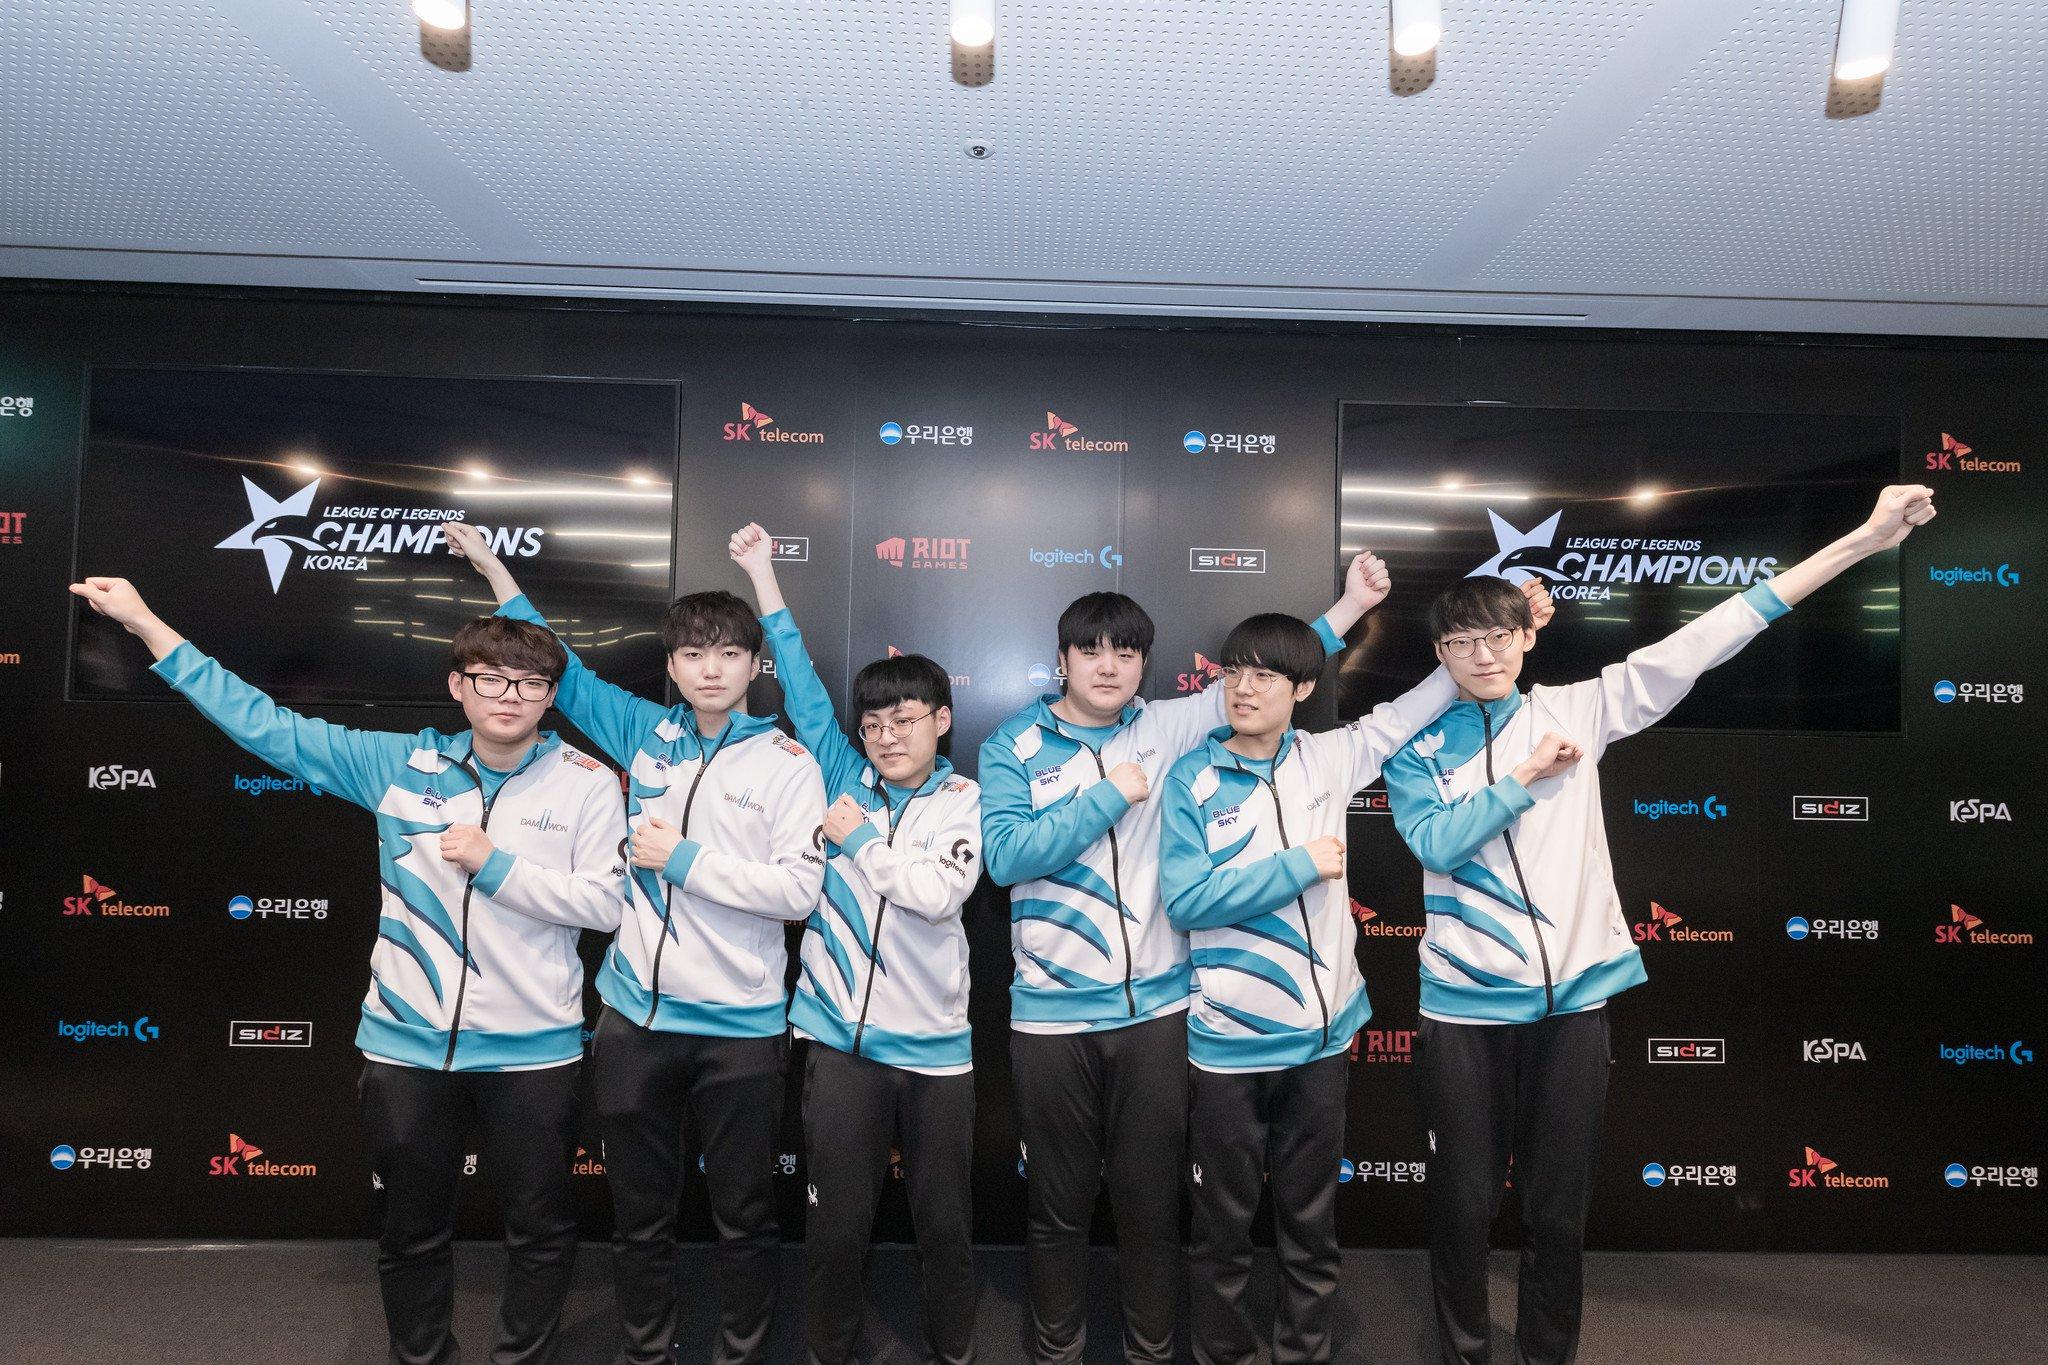 Damwon Gaming Destroy Team Dynamics In League Champions Korea Summer Split 2020